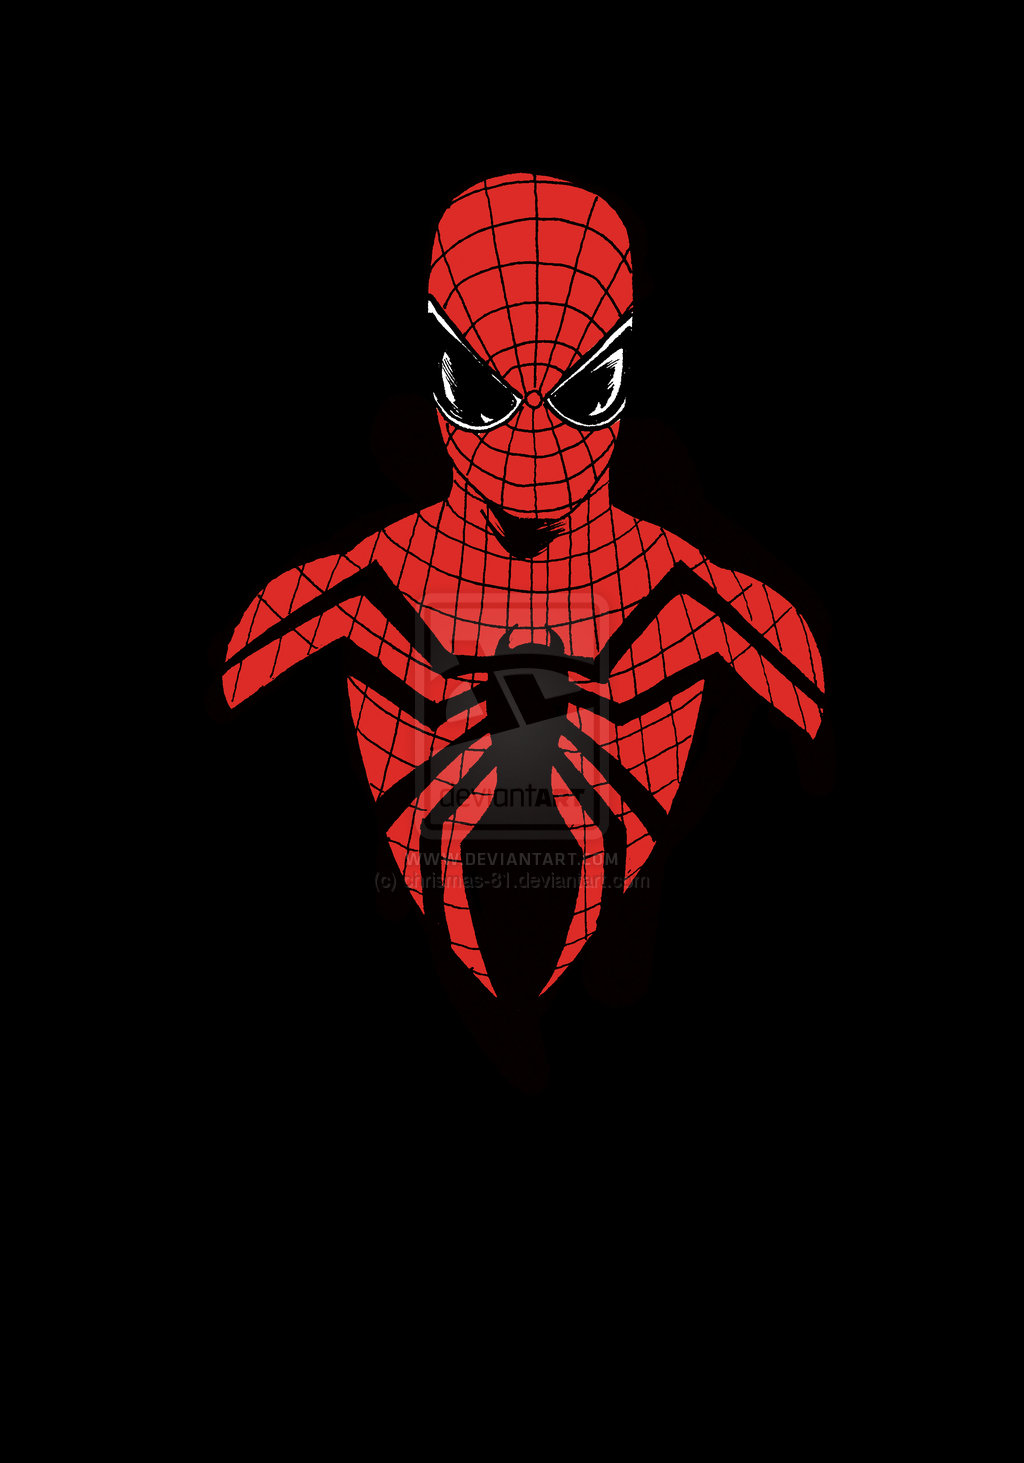 download Spiderman Logo Wallpaper Iphone 5 Spiderman logo 1024x1463